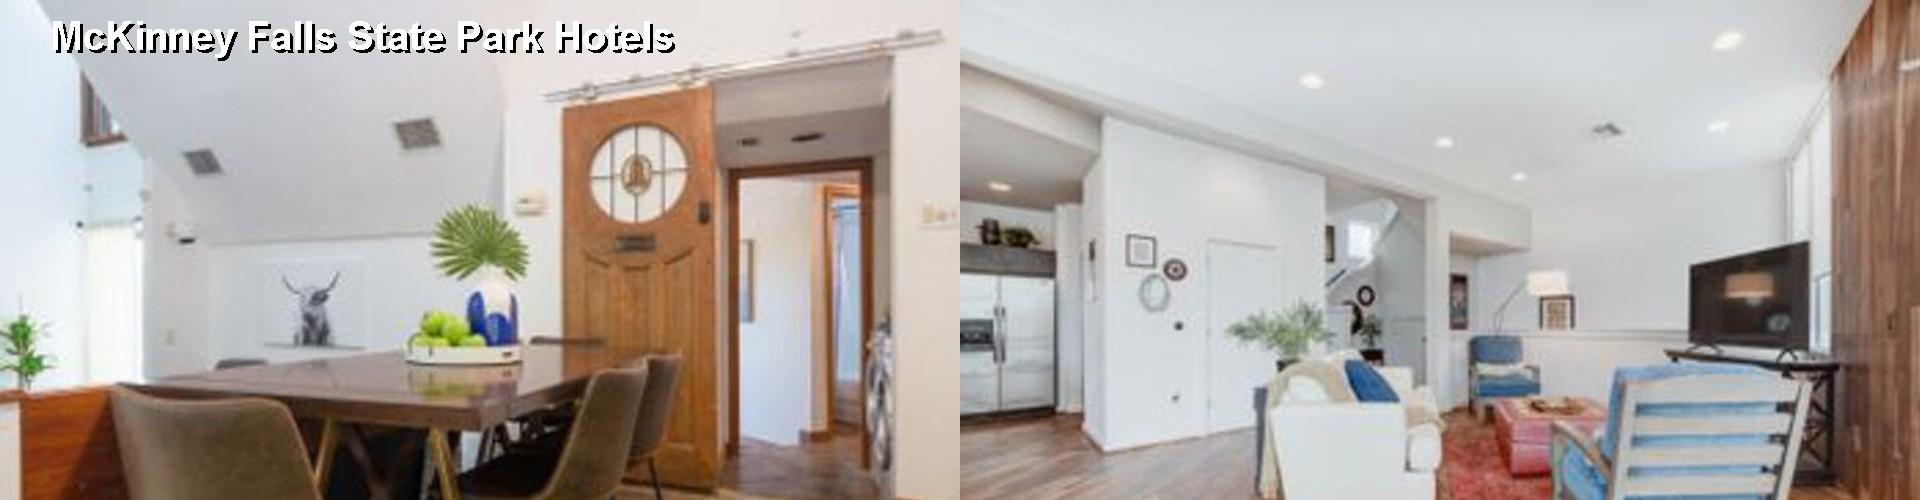 Hotels Near Mckinney Falls State Park In Austin Tx